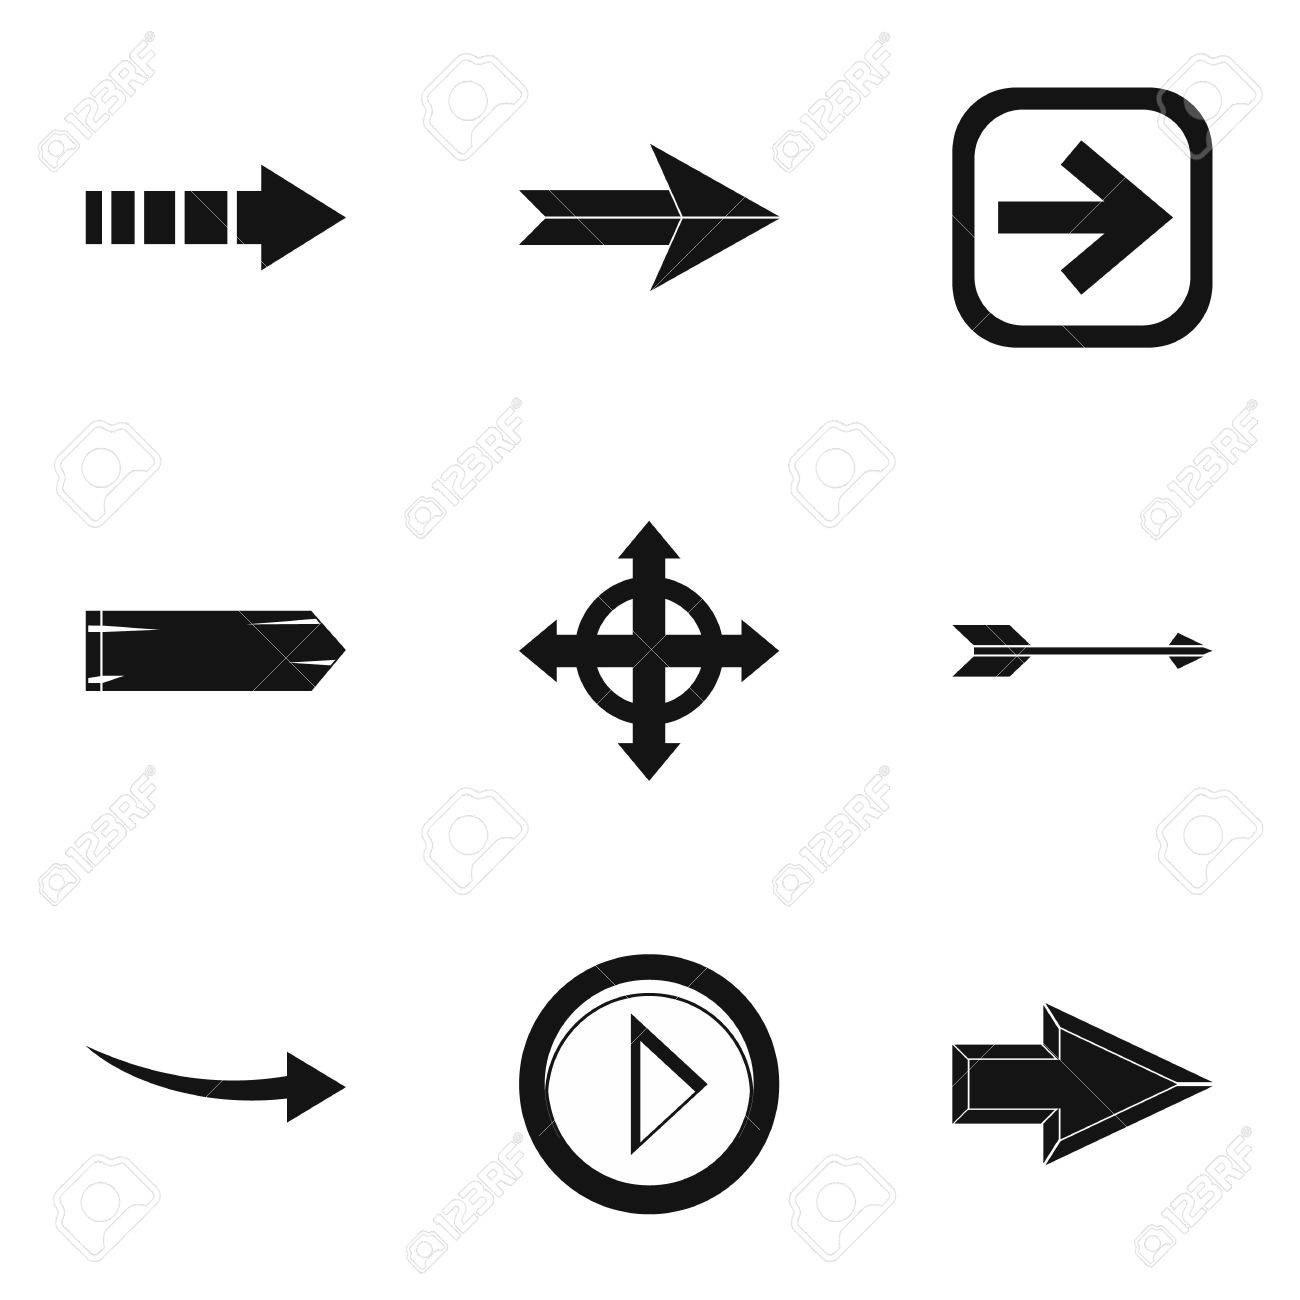 types of arrows icons set simple illustration of 9 types of rh 123rf com Arrow Vector Clip Art Indian Arrow Vector